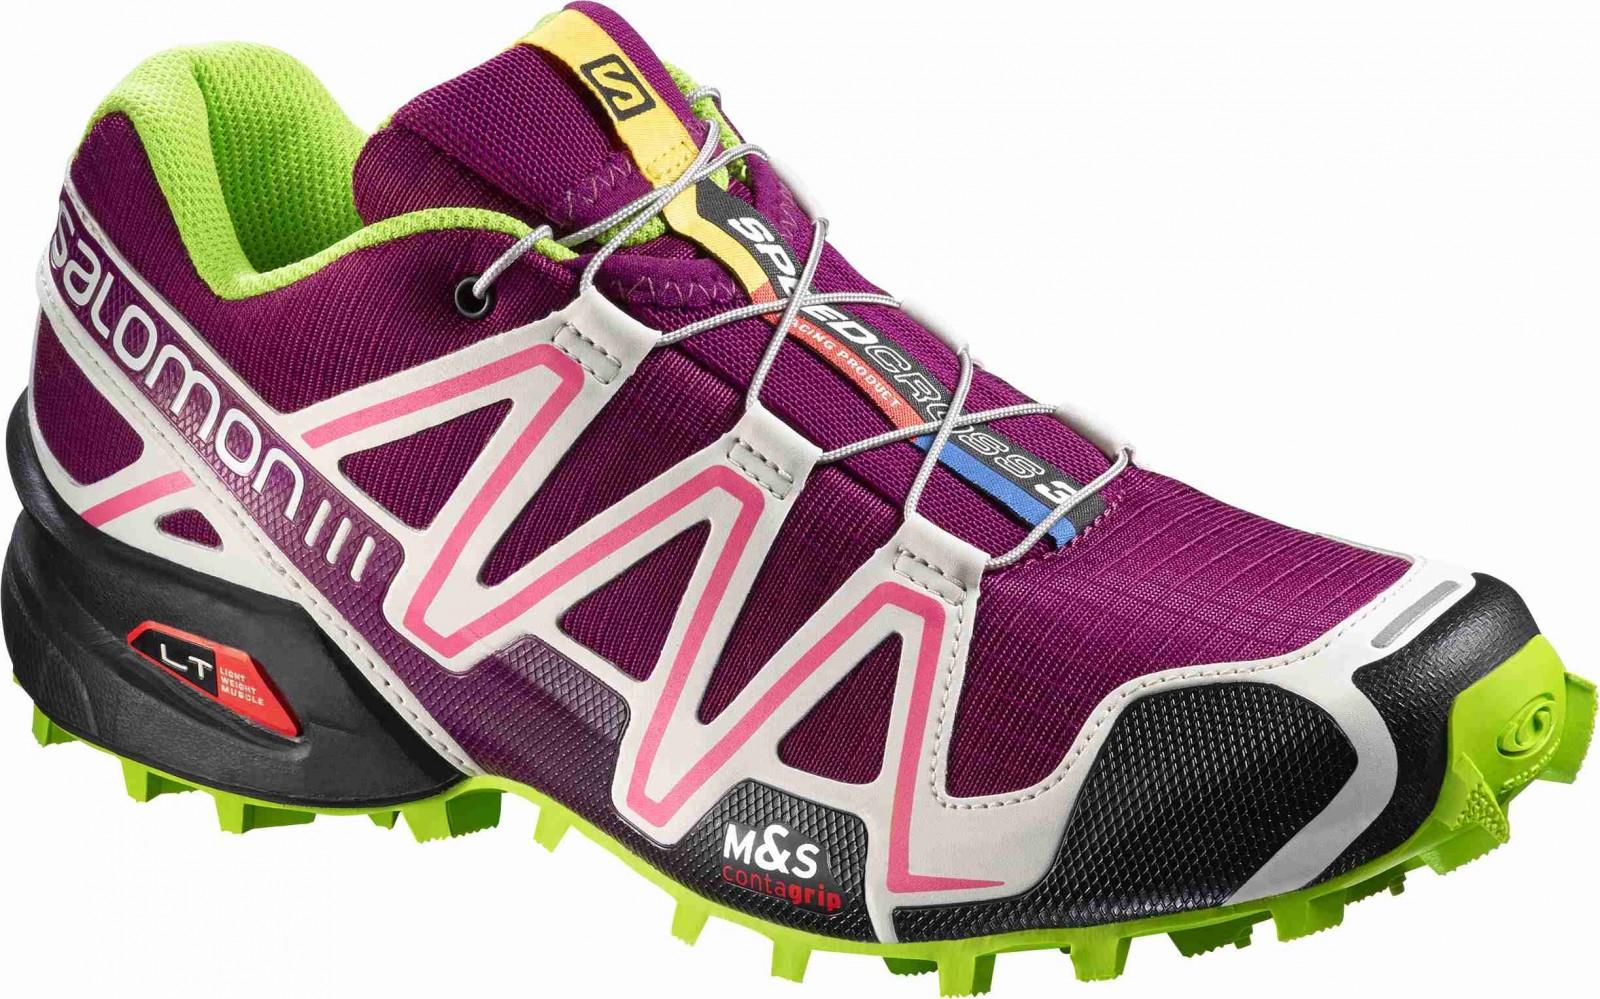 Dámské běžecké boty Salomon SPEEDCROSS 3 W MYSTIC PURPLE G  7156532a5b